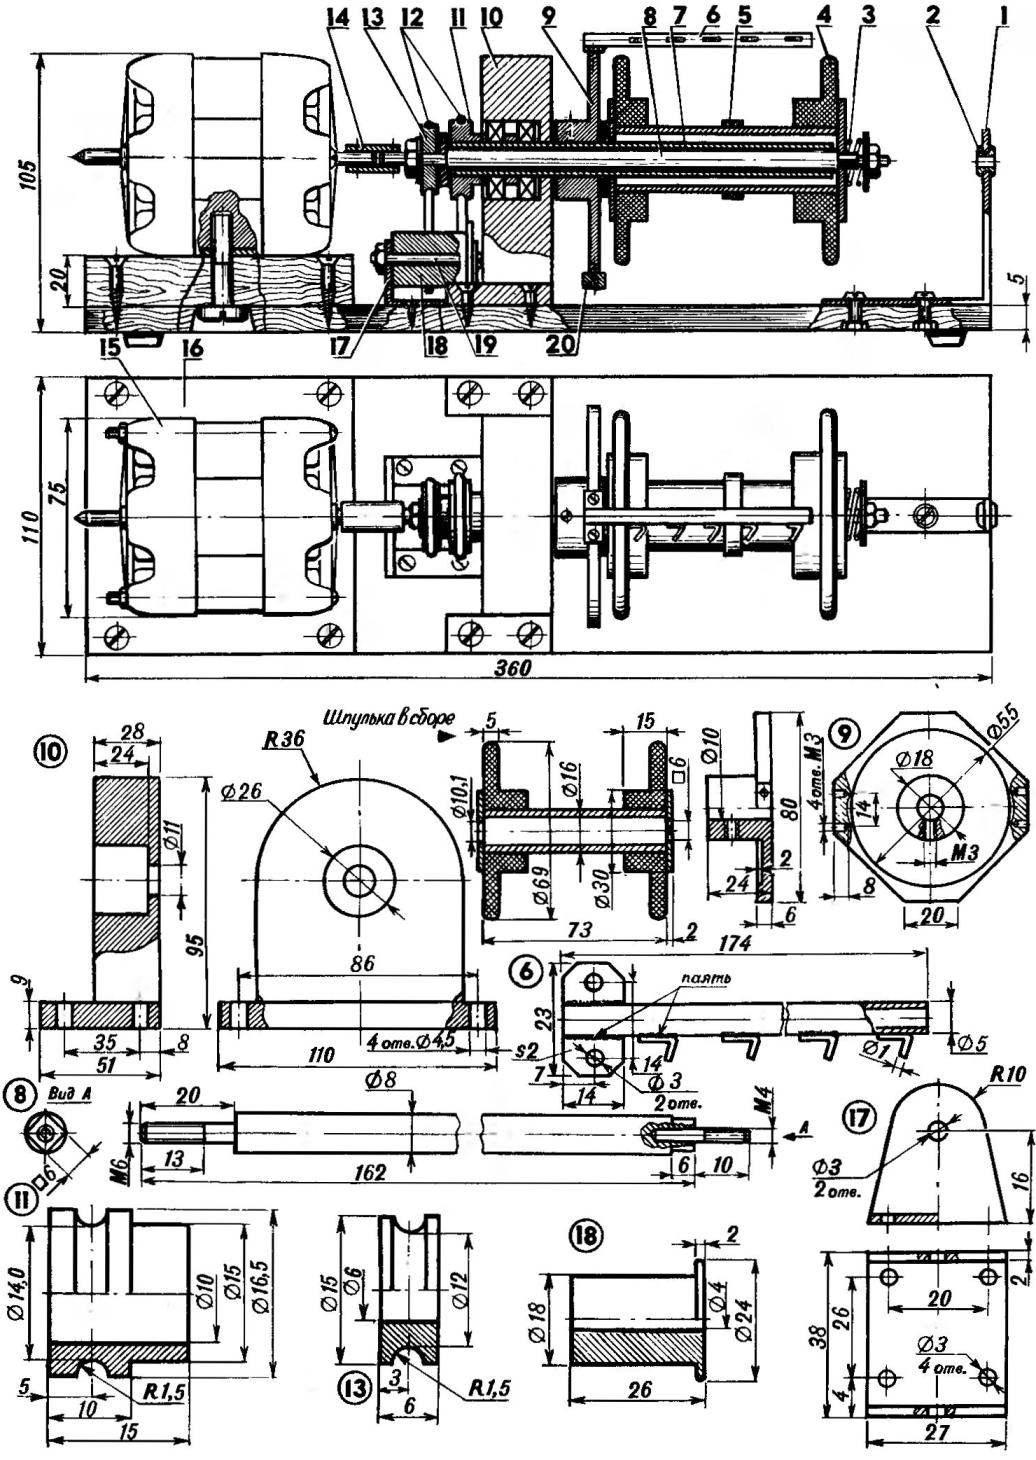 Design electroplate